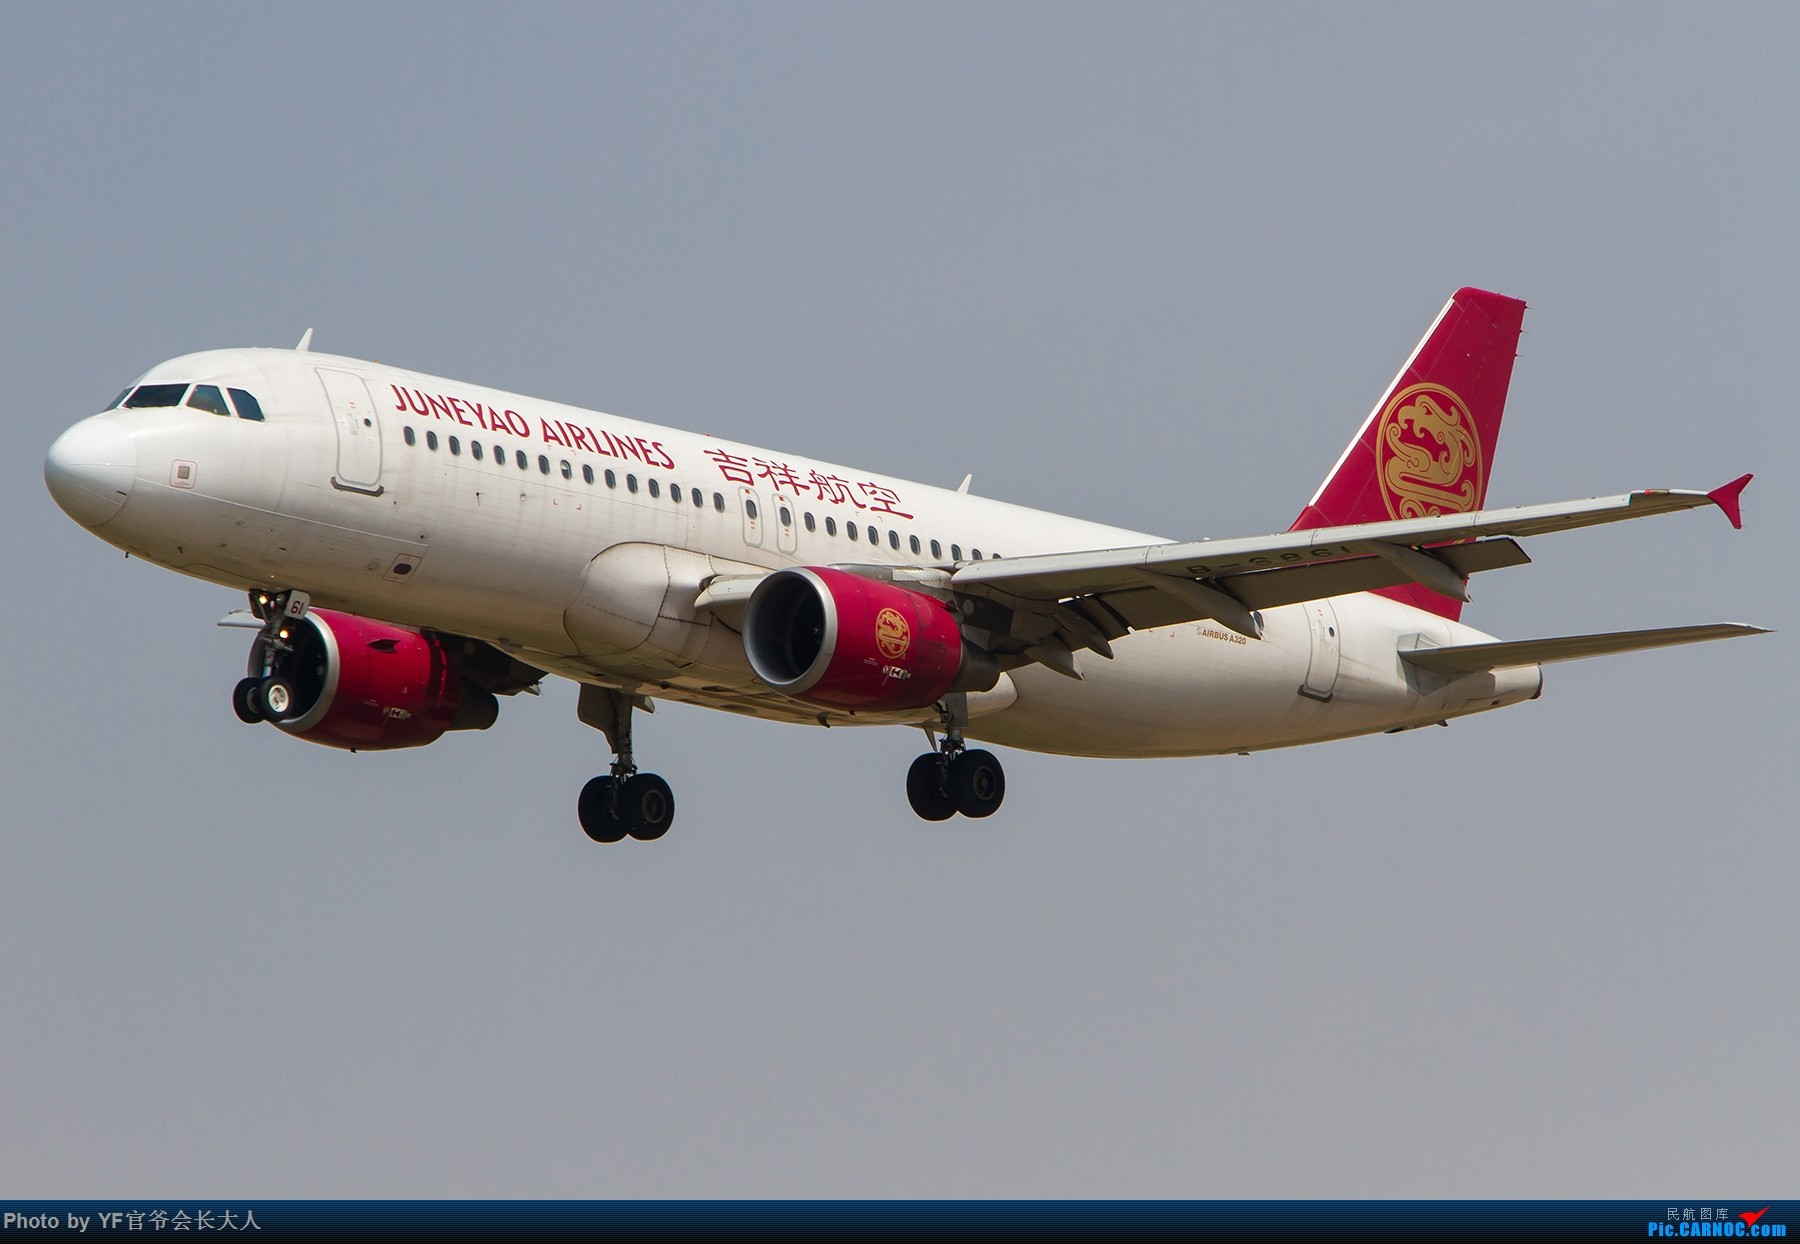 Re:[原创]【ZYTX】轻易不拍机,拍就要拍个过瘾!(新开的酷鸟,亚洲大西洋,顺带碰上朝韩两国的好货) AIRBUS A320-200 B-6861 中国沈阳桃仙国际机场